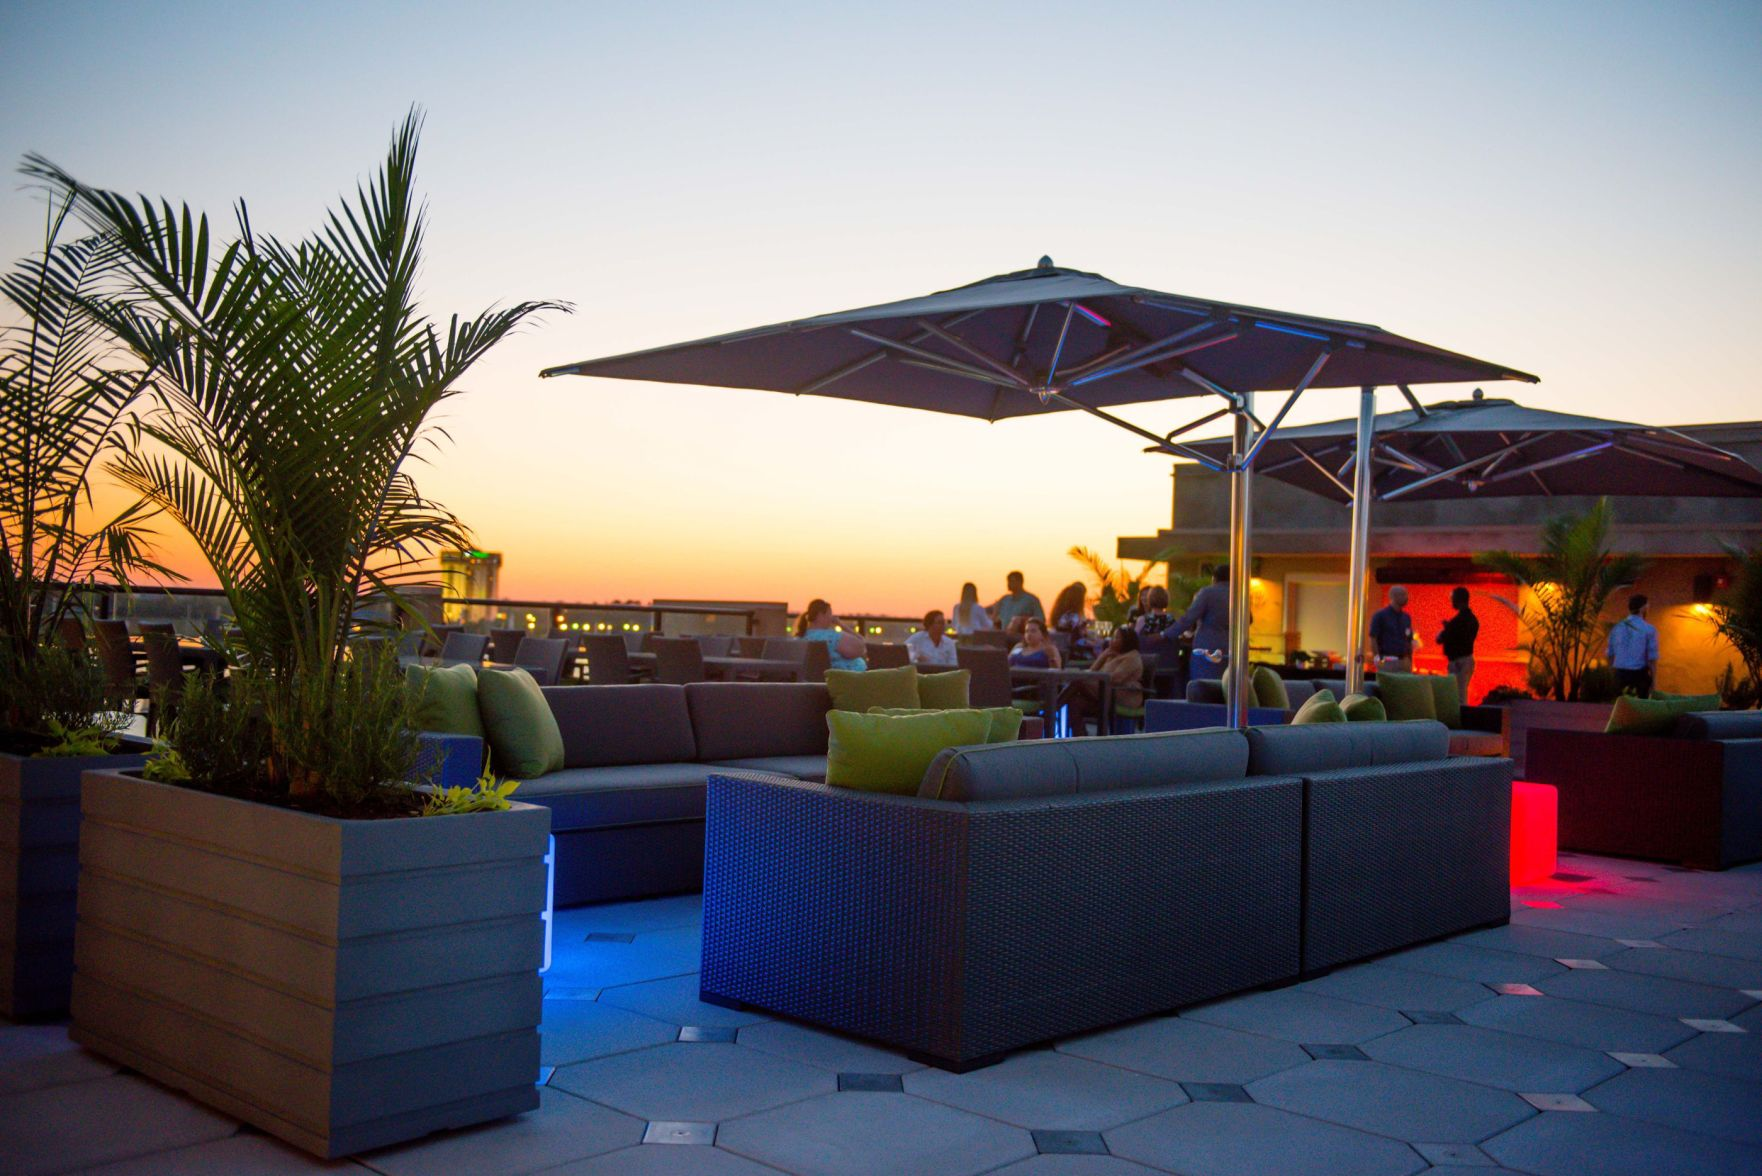 New Rooftop Lounge Opens At Hilton Garden Inn On Lockwood